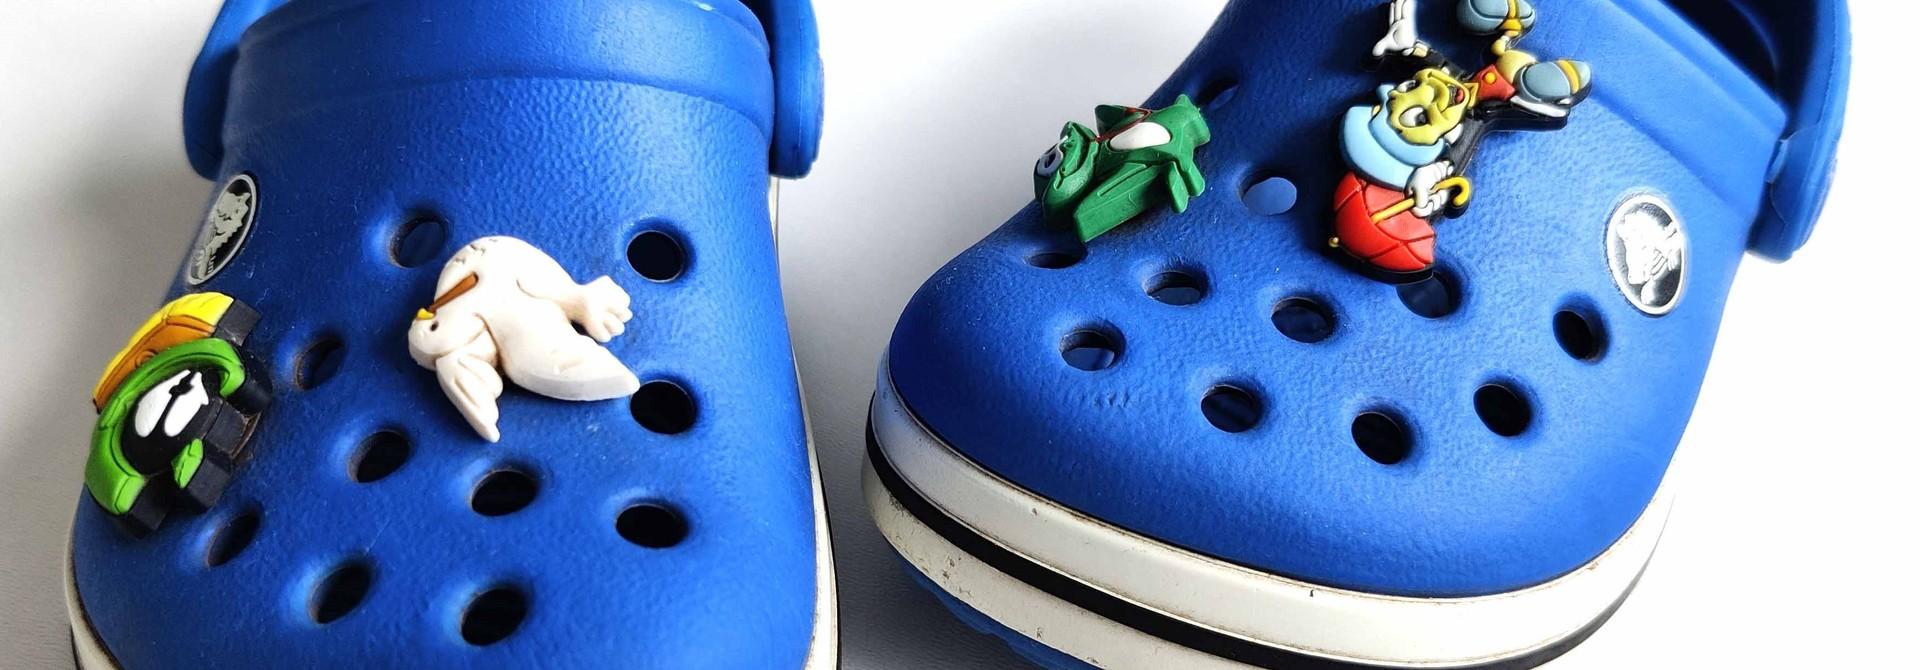 Crocs maat 19-21